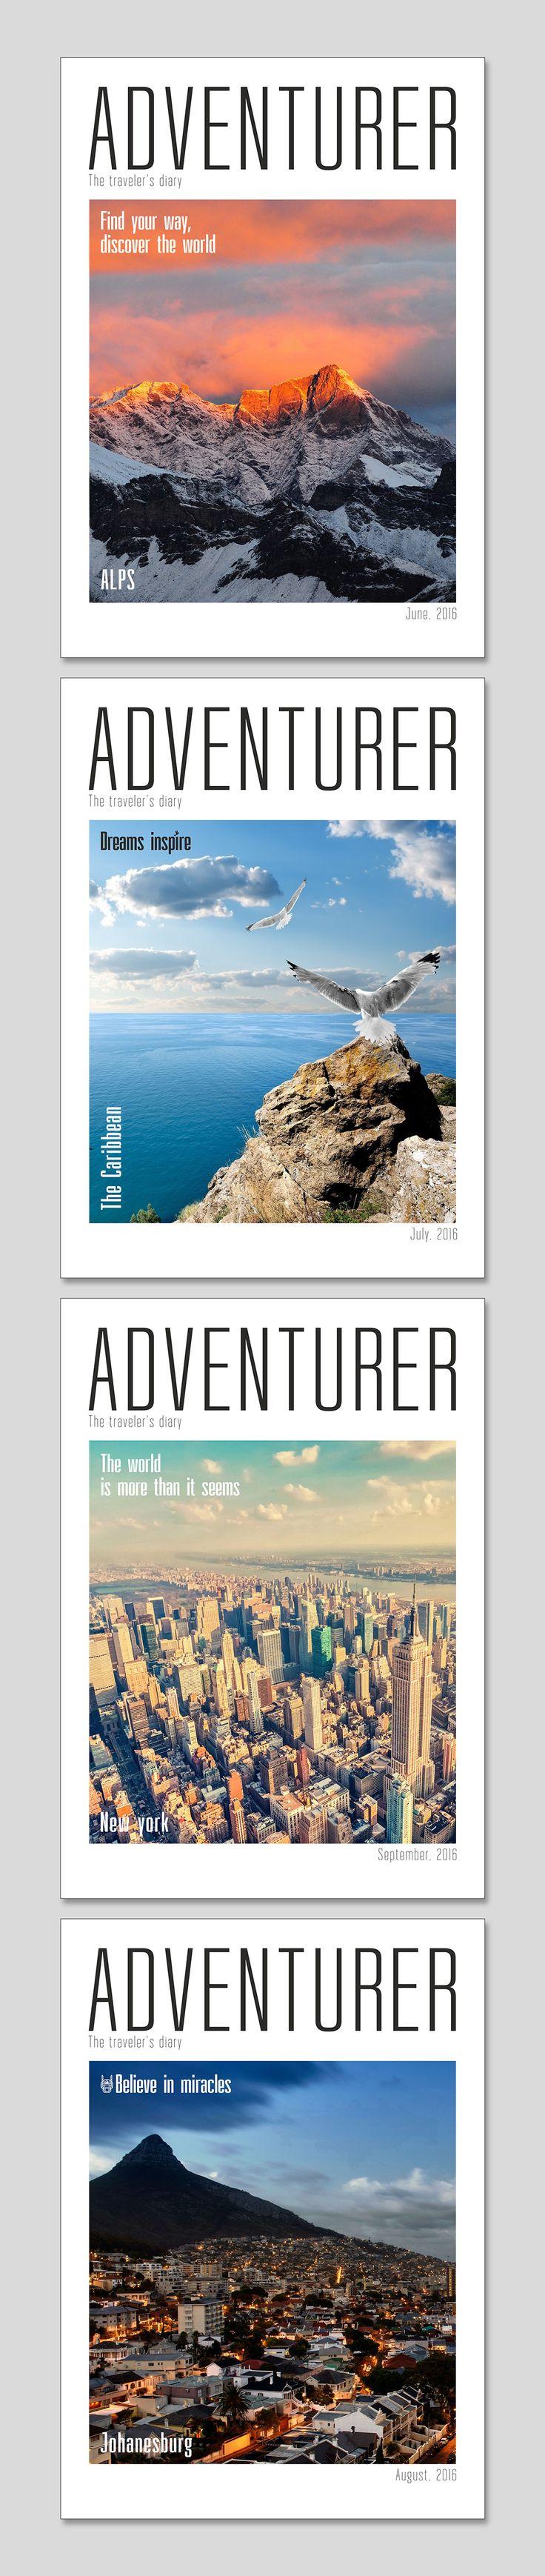 Дизайн обложки журнала путешественника on Behance